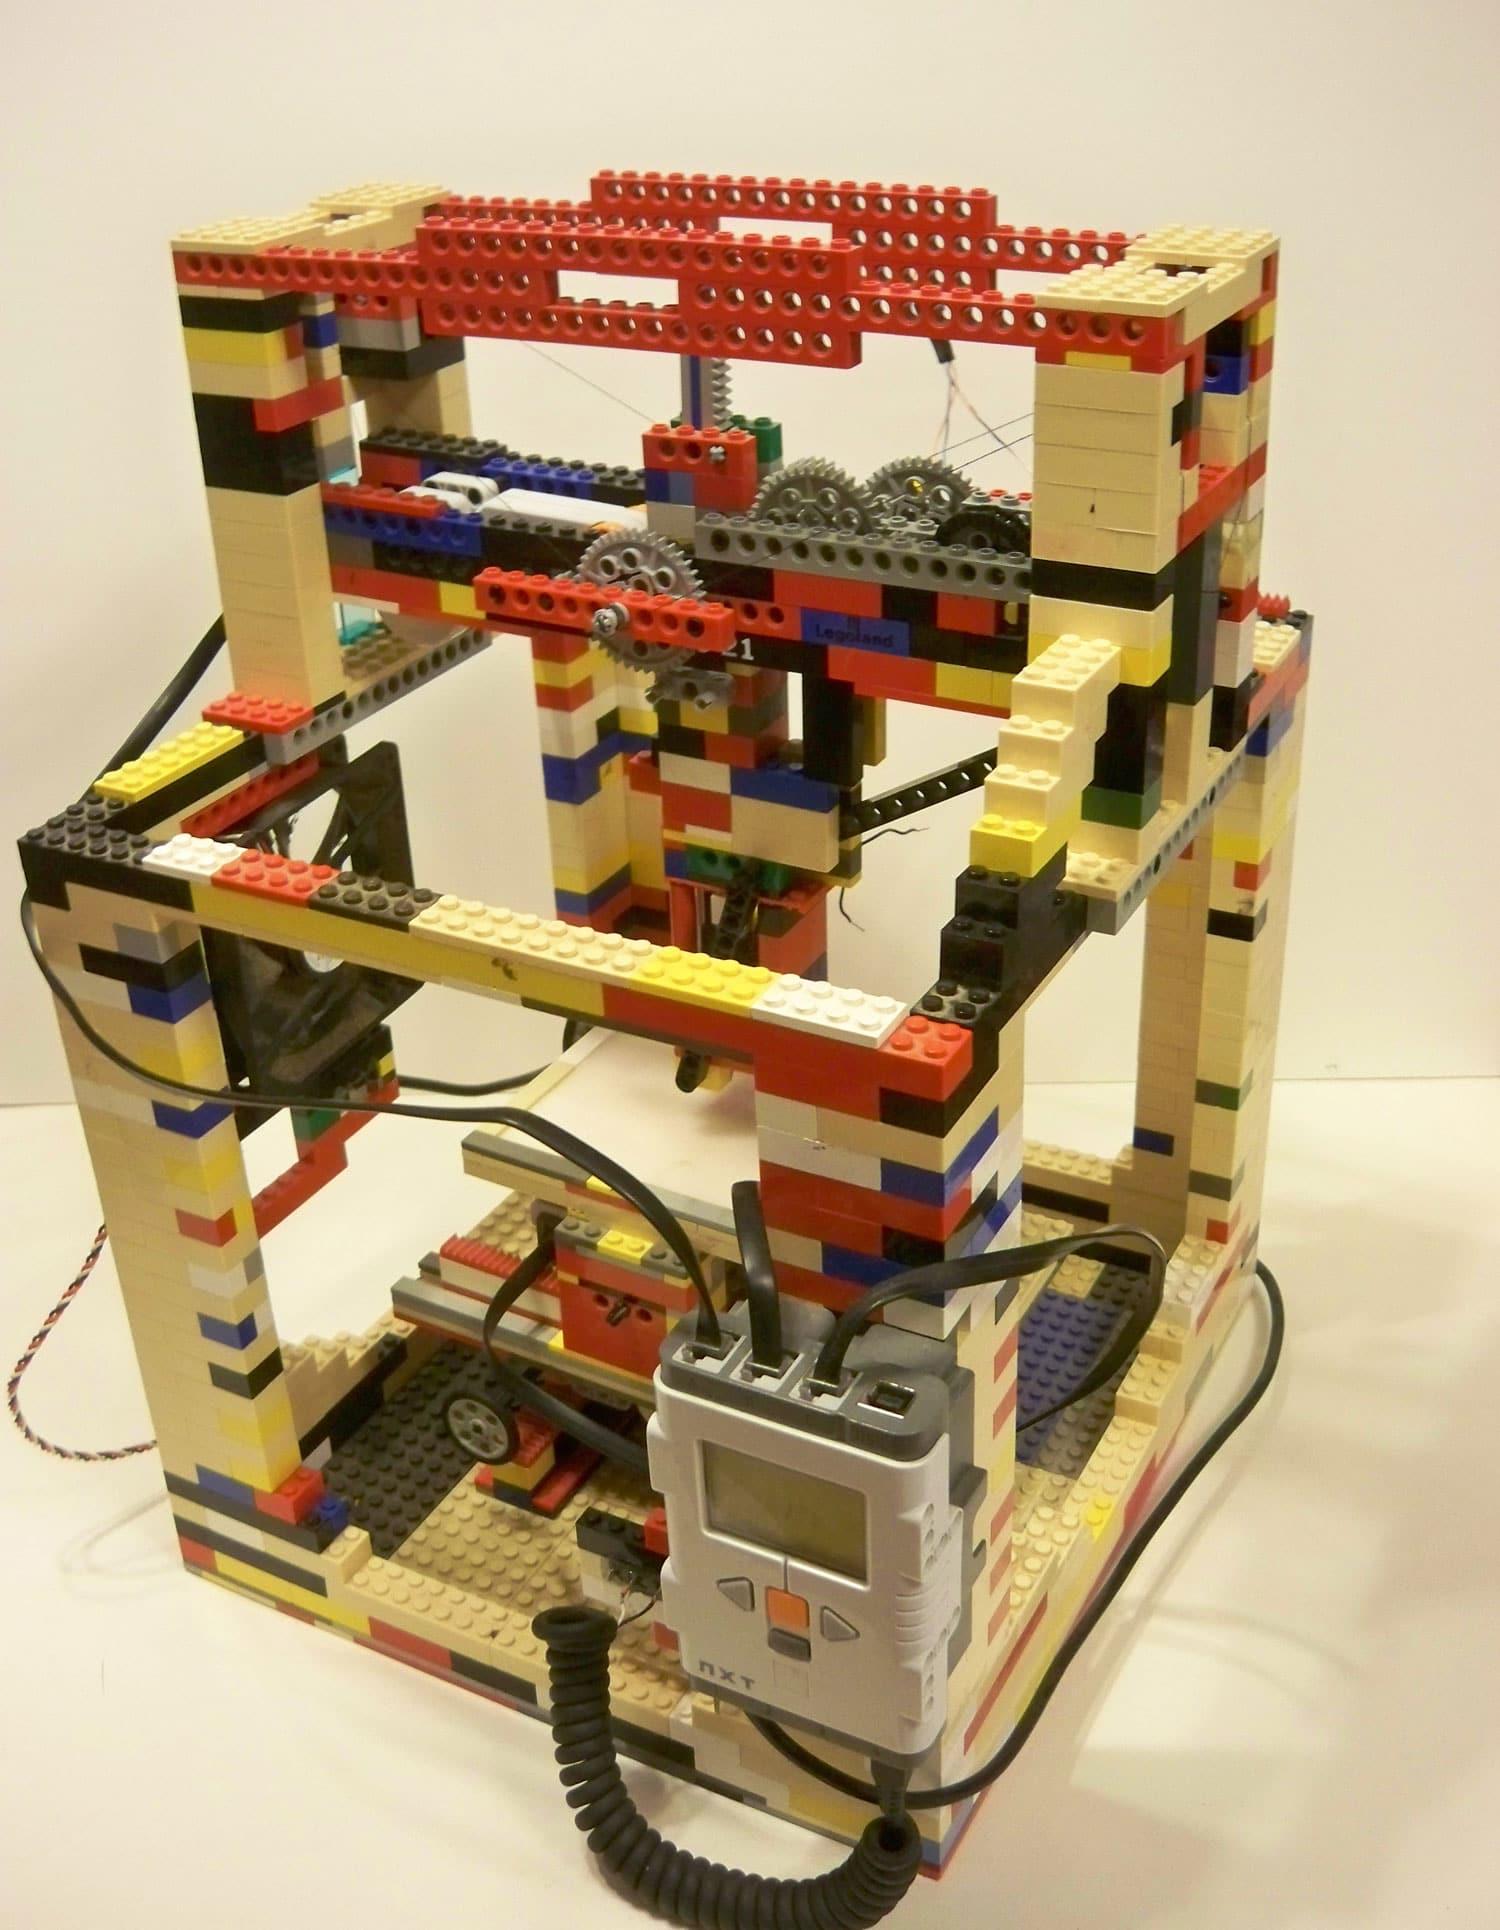 functional-lego-3d-printer-build